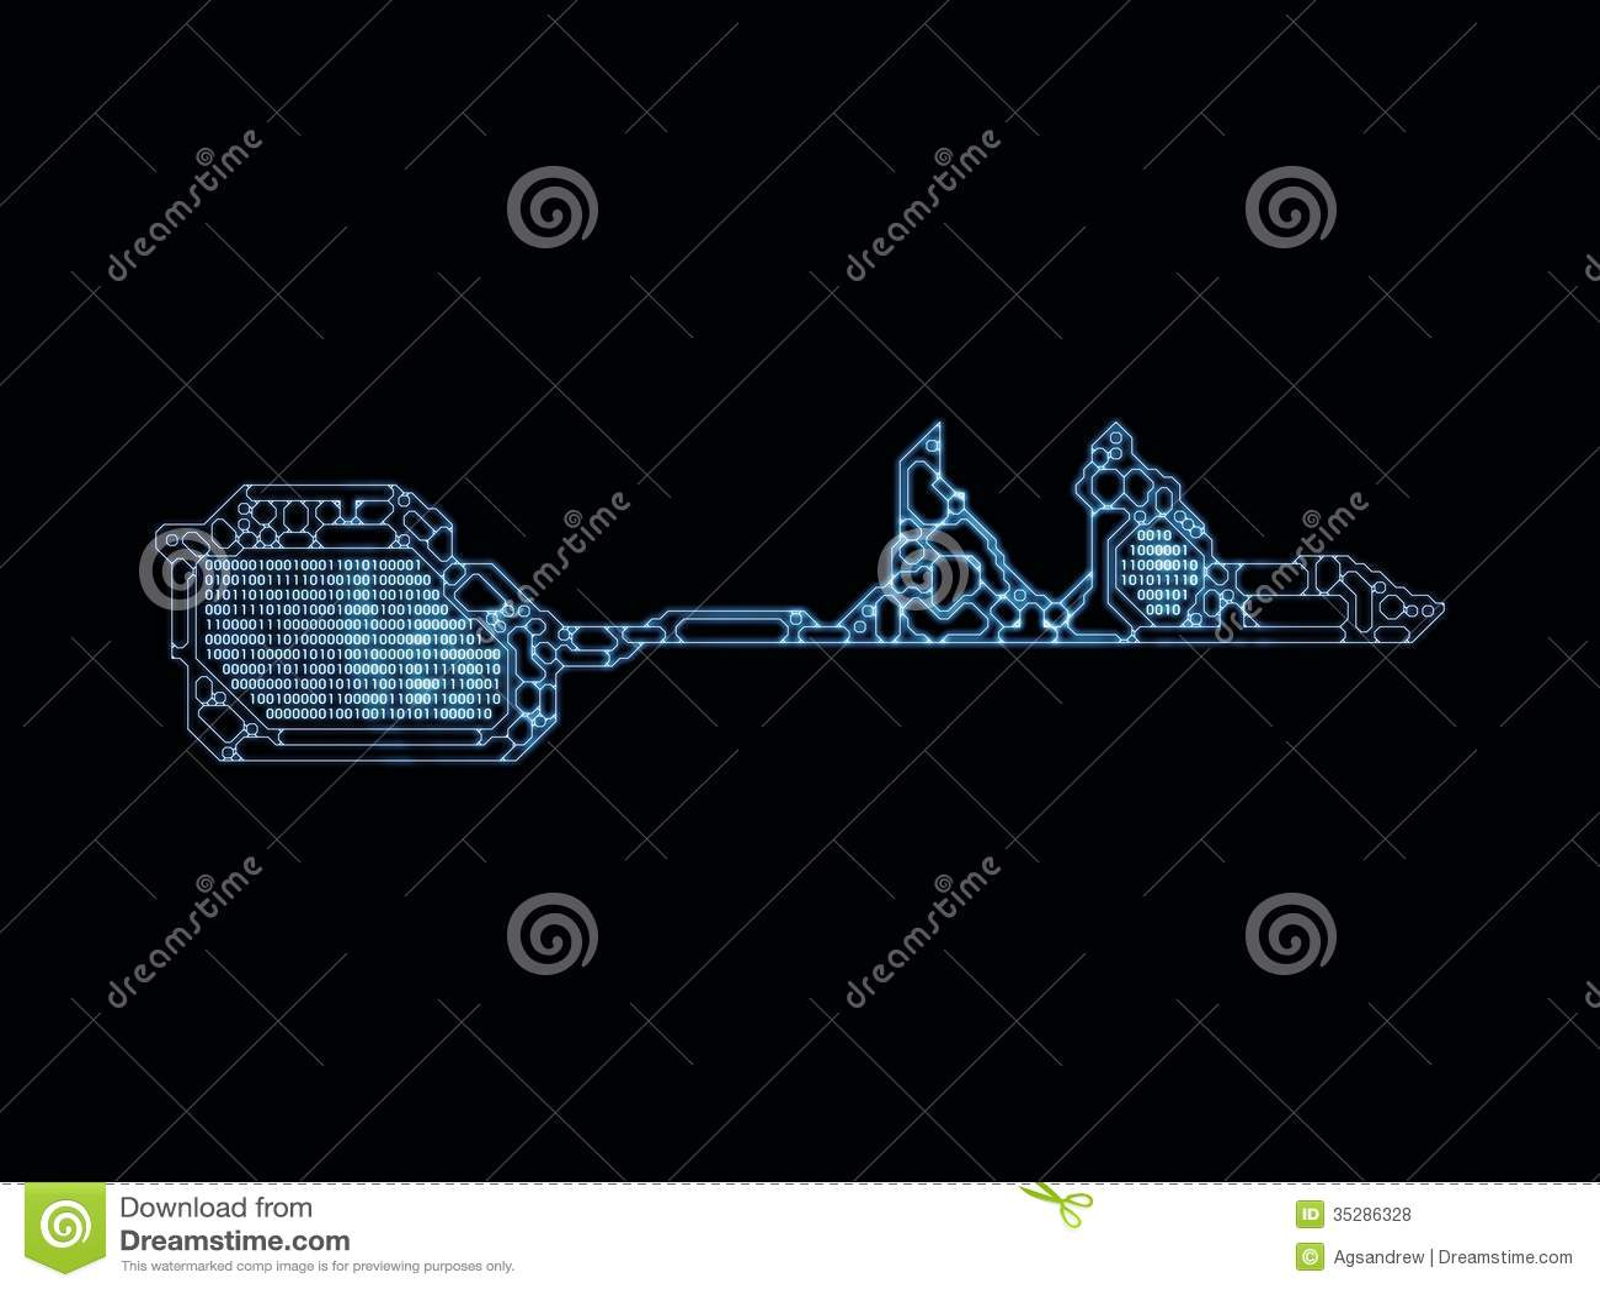 Virtual Key Code stock photo  Image of element, knowledge - 35286328